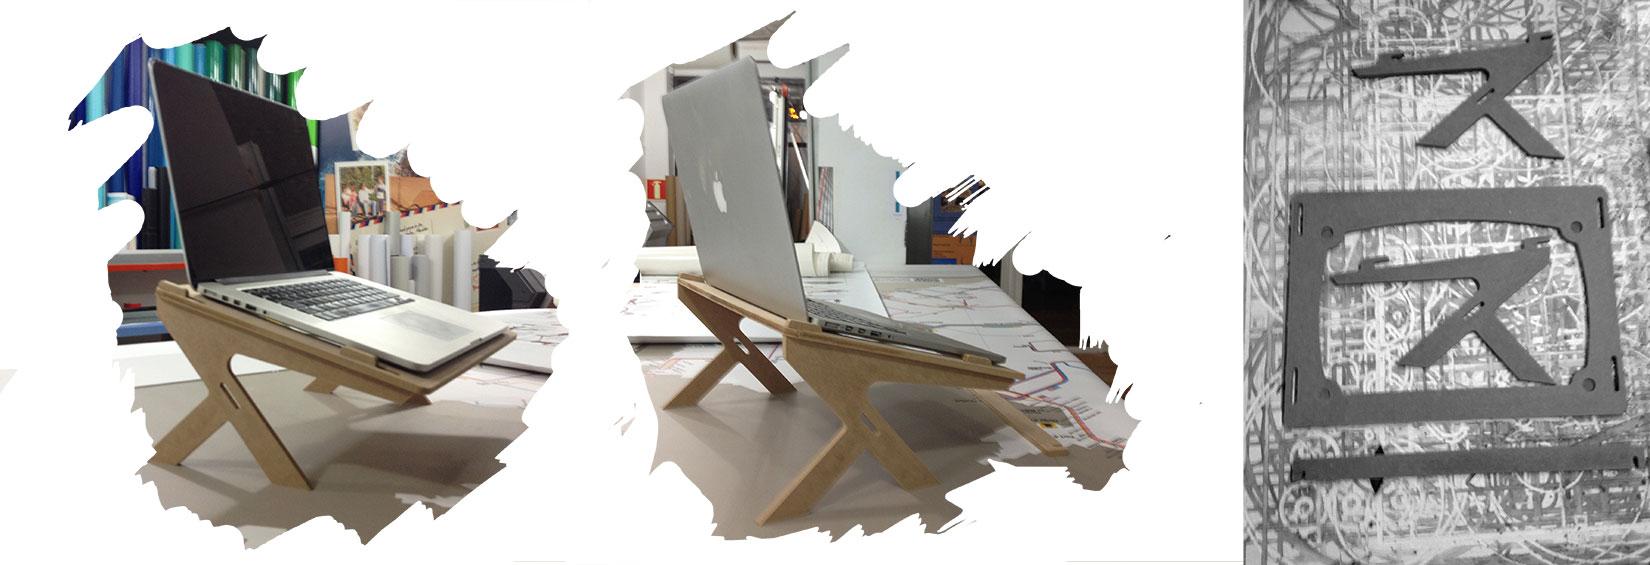 soporte-portatil-madera